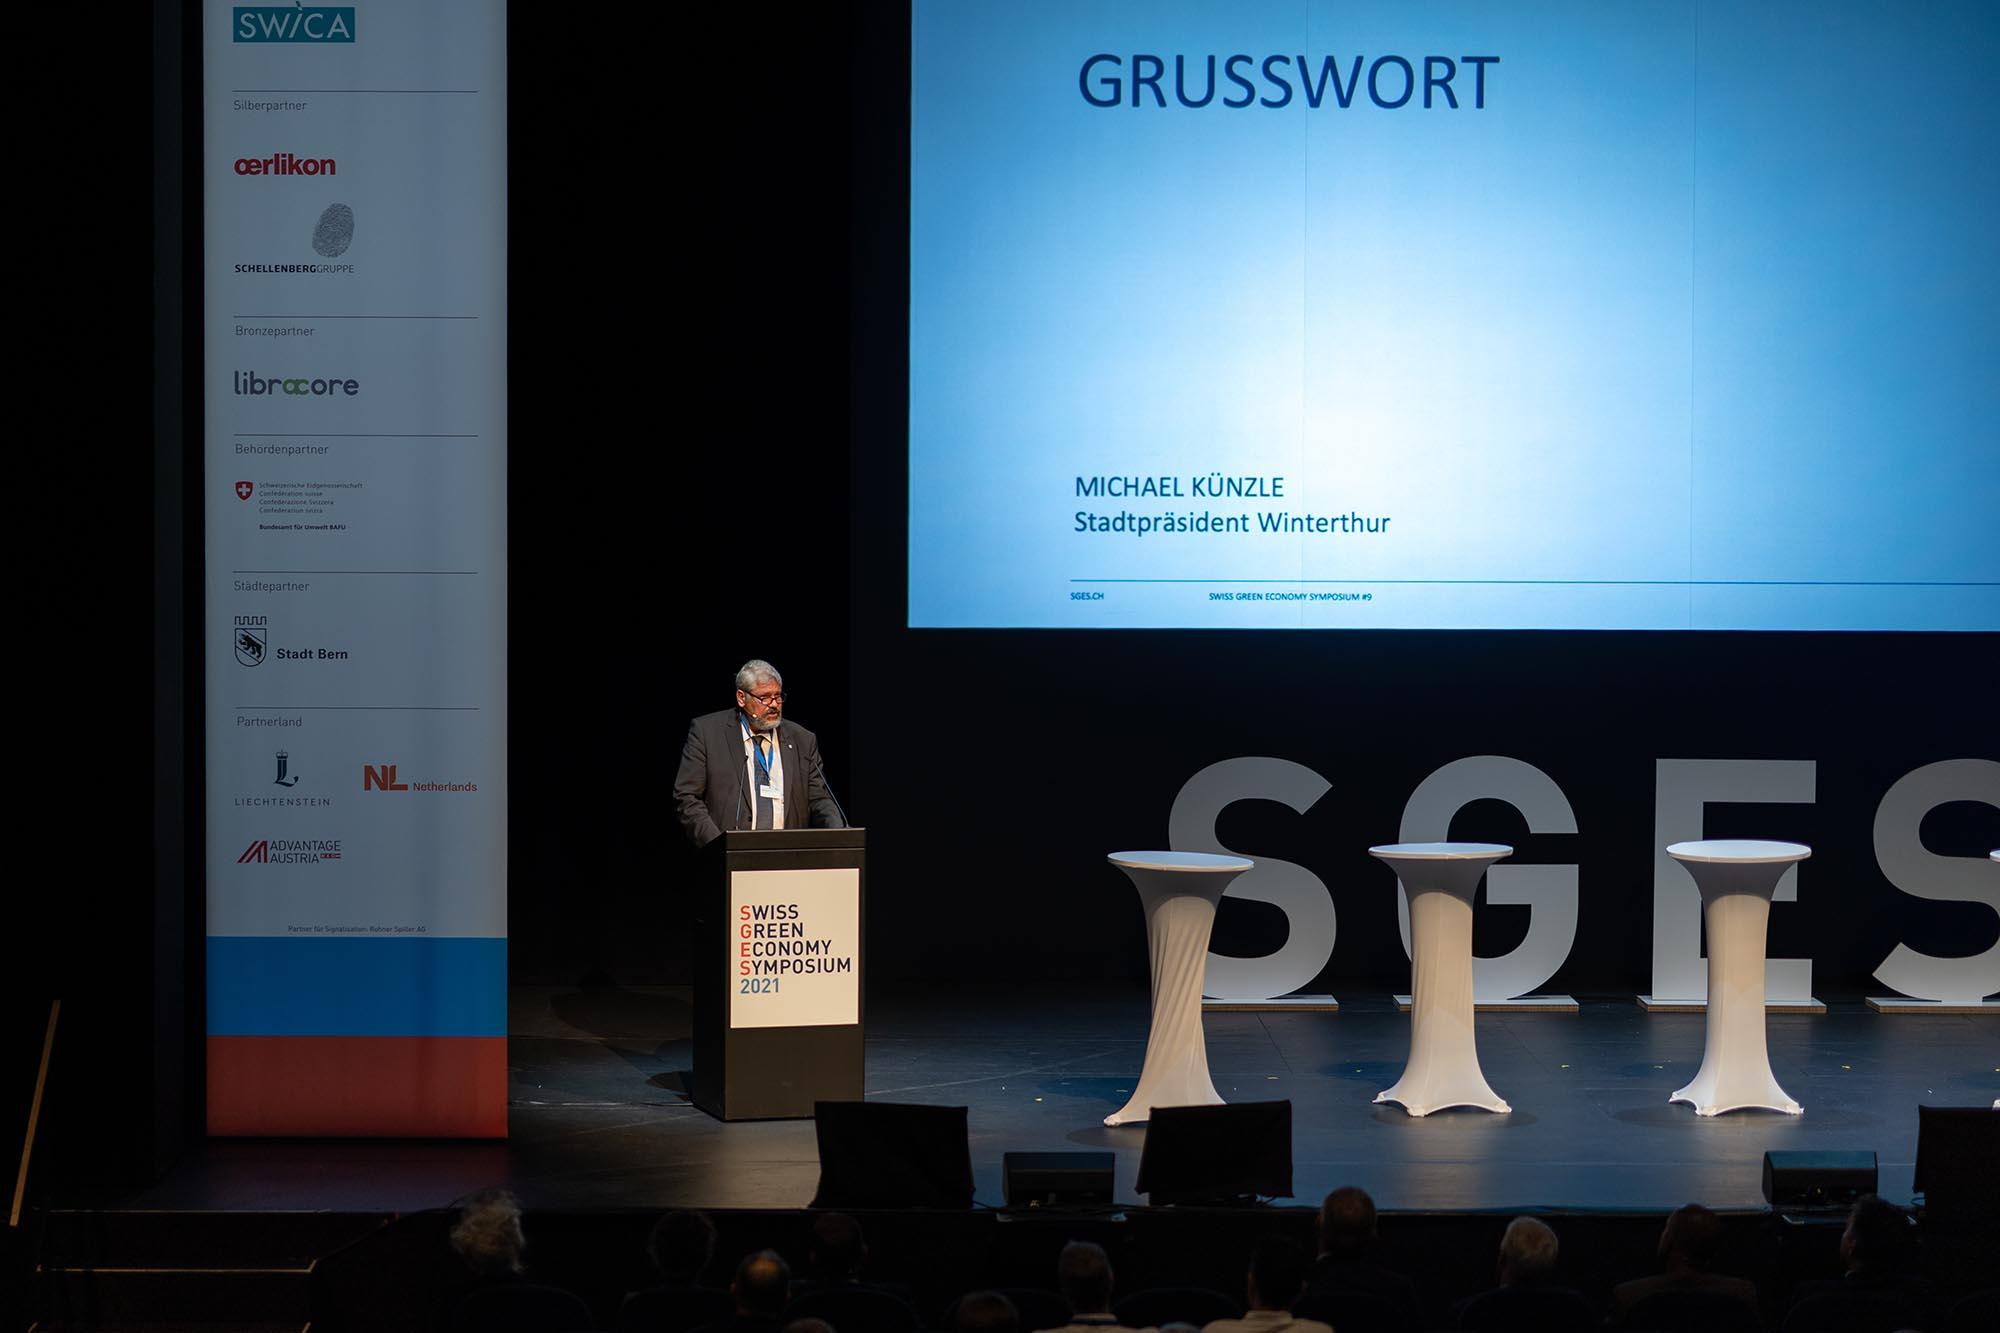 SGES Grusswort: Michael Künzle, Stadtpräsident Winterthur